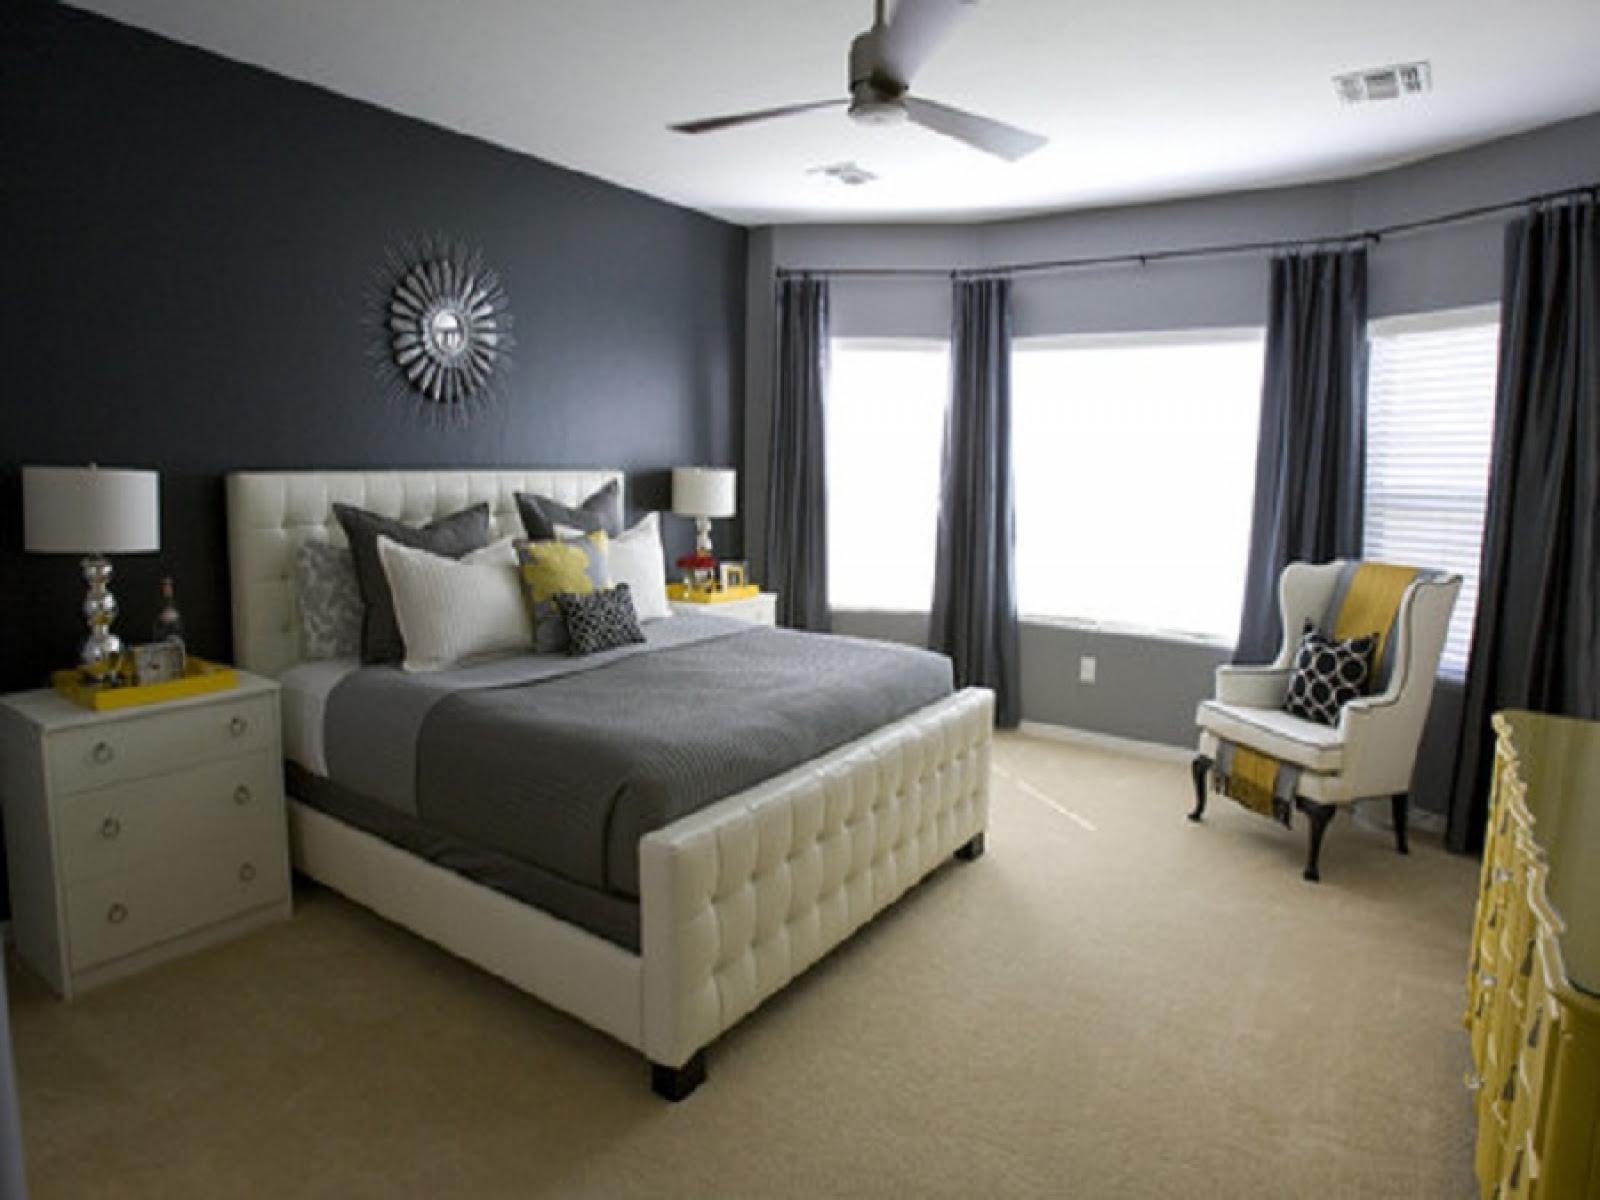 Design Ideas For Girls Bedrooms | Joy Studio Design ...